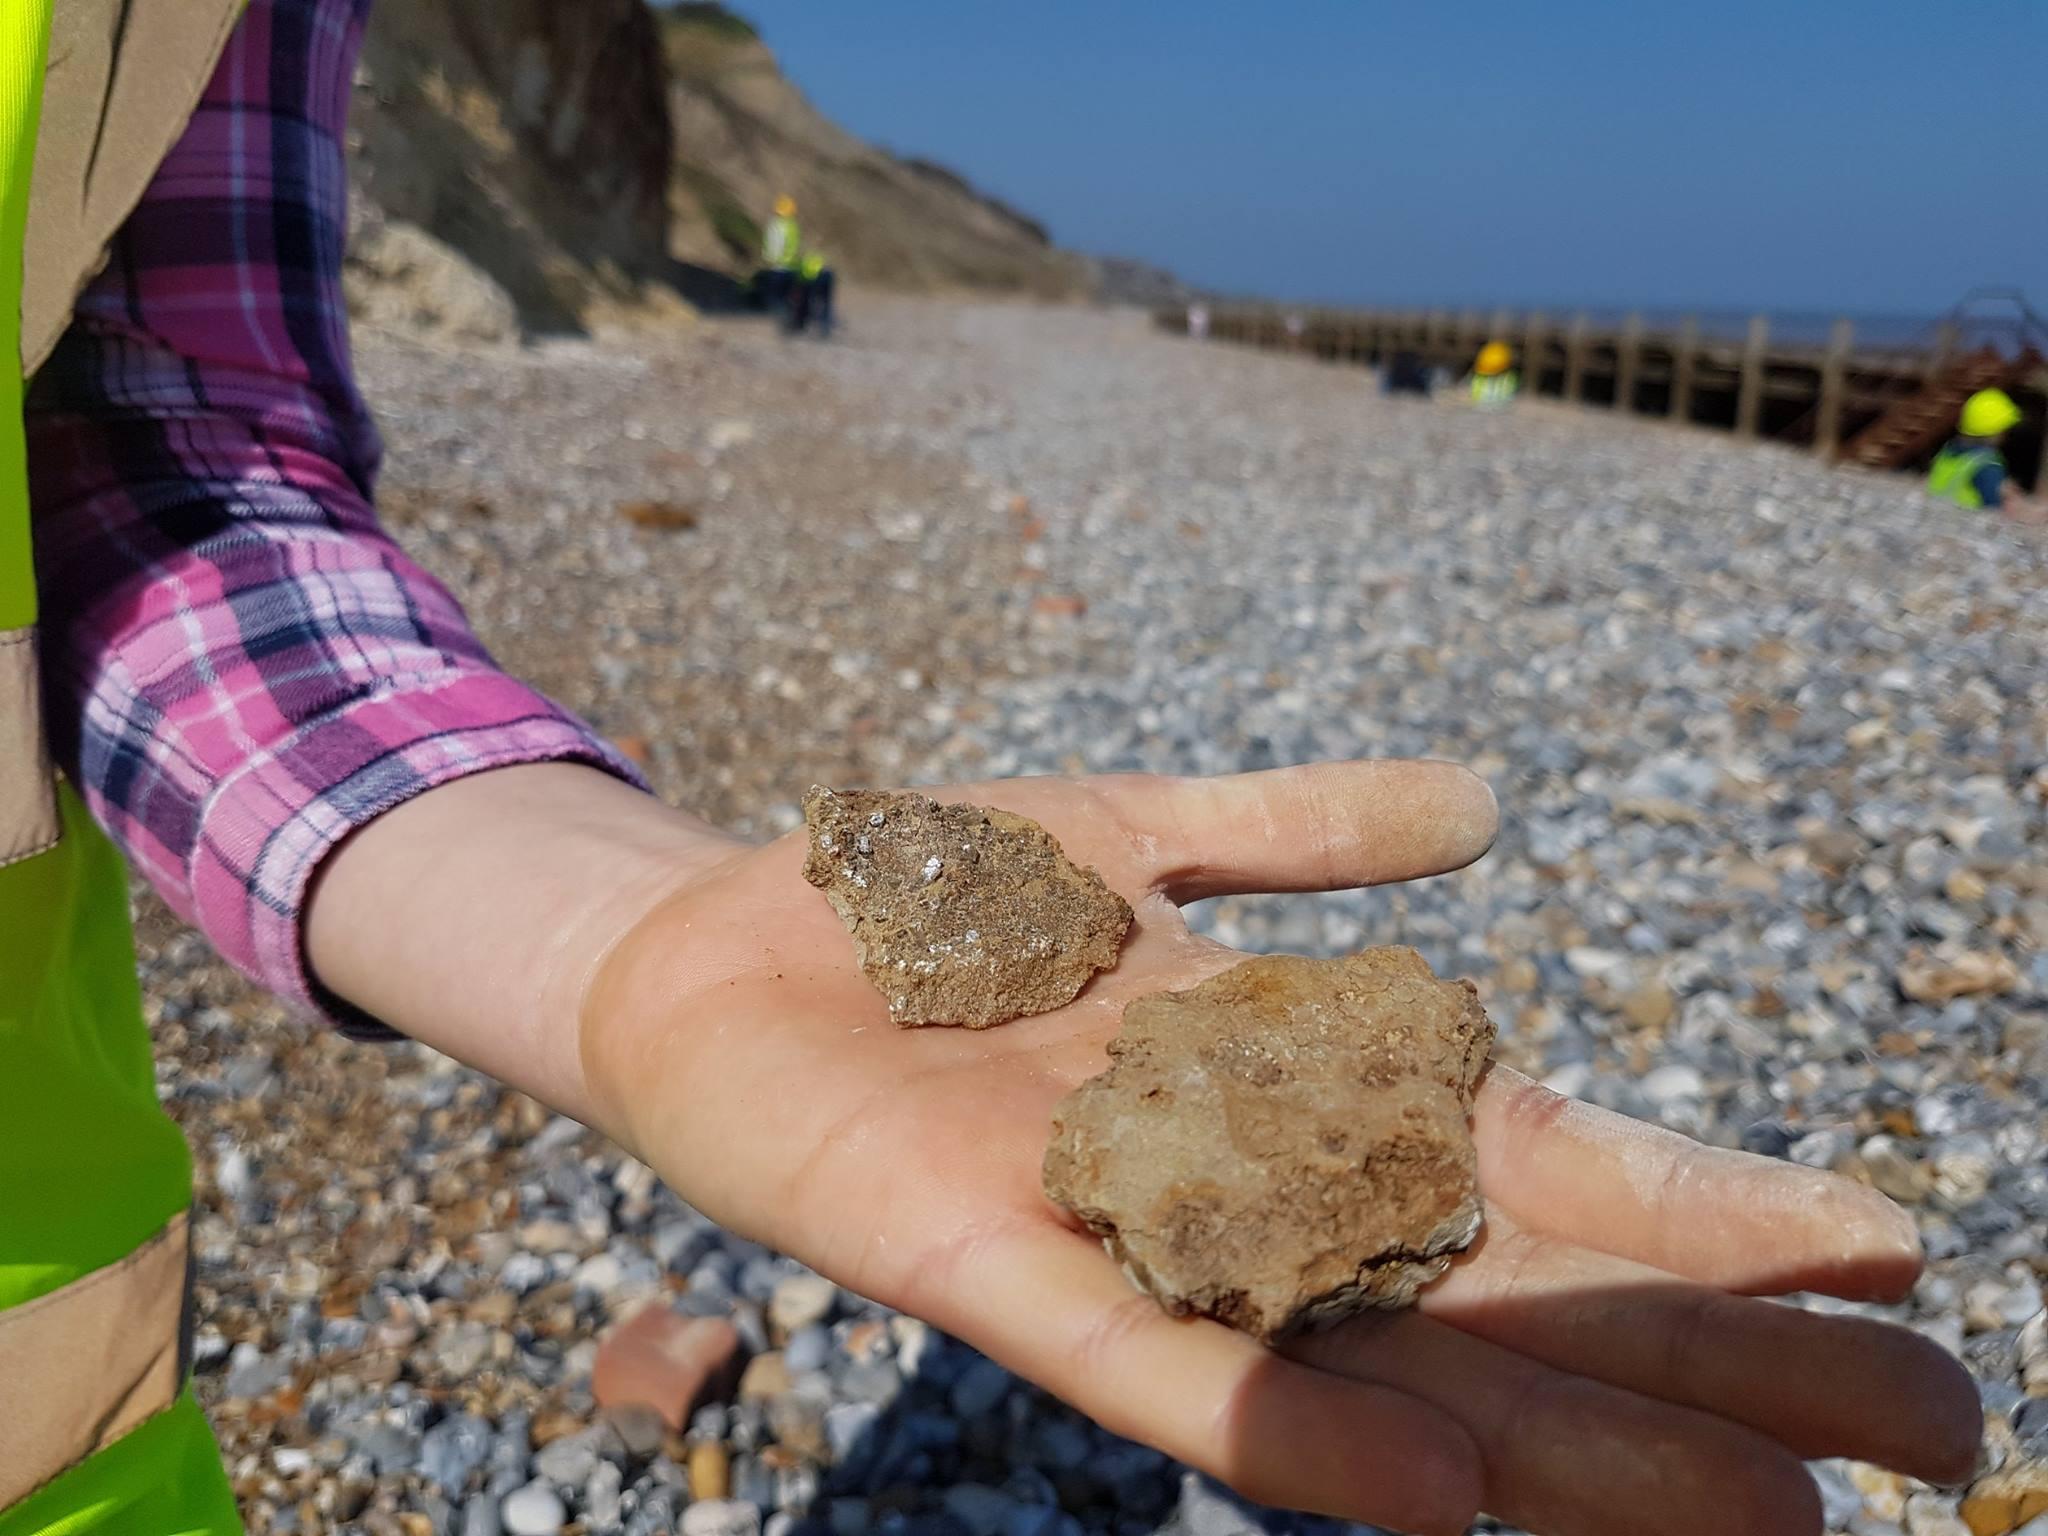 Some nice gypsum crystals found by Poppy Hewit.